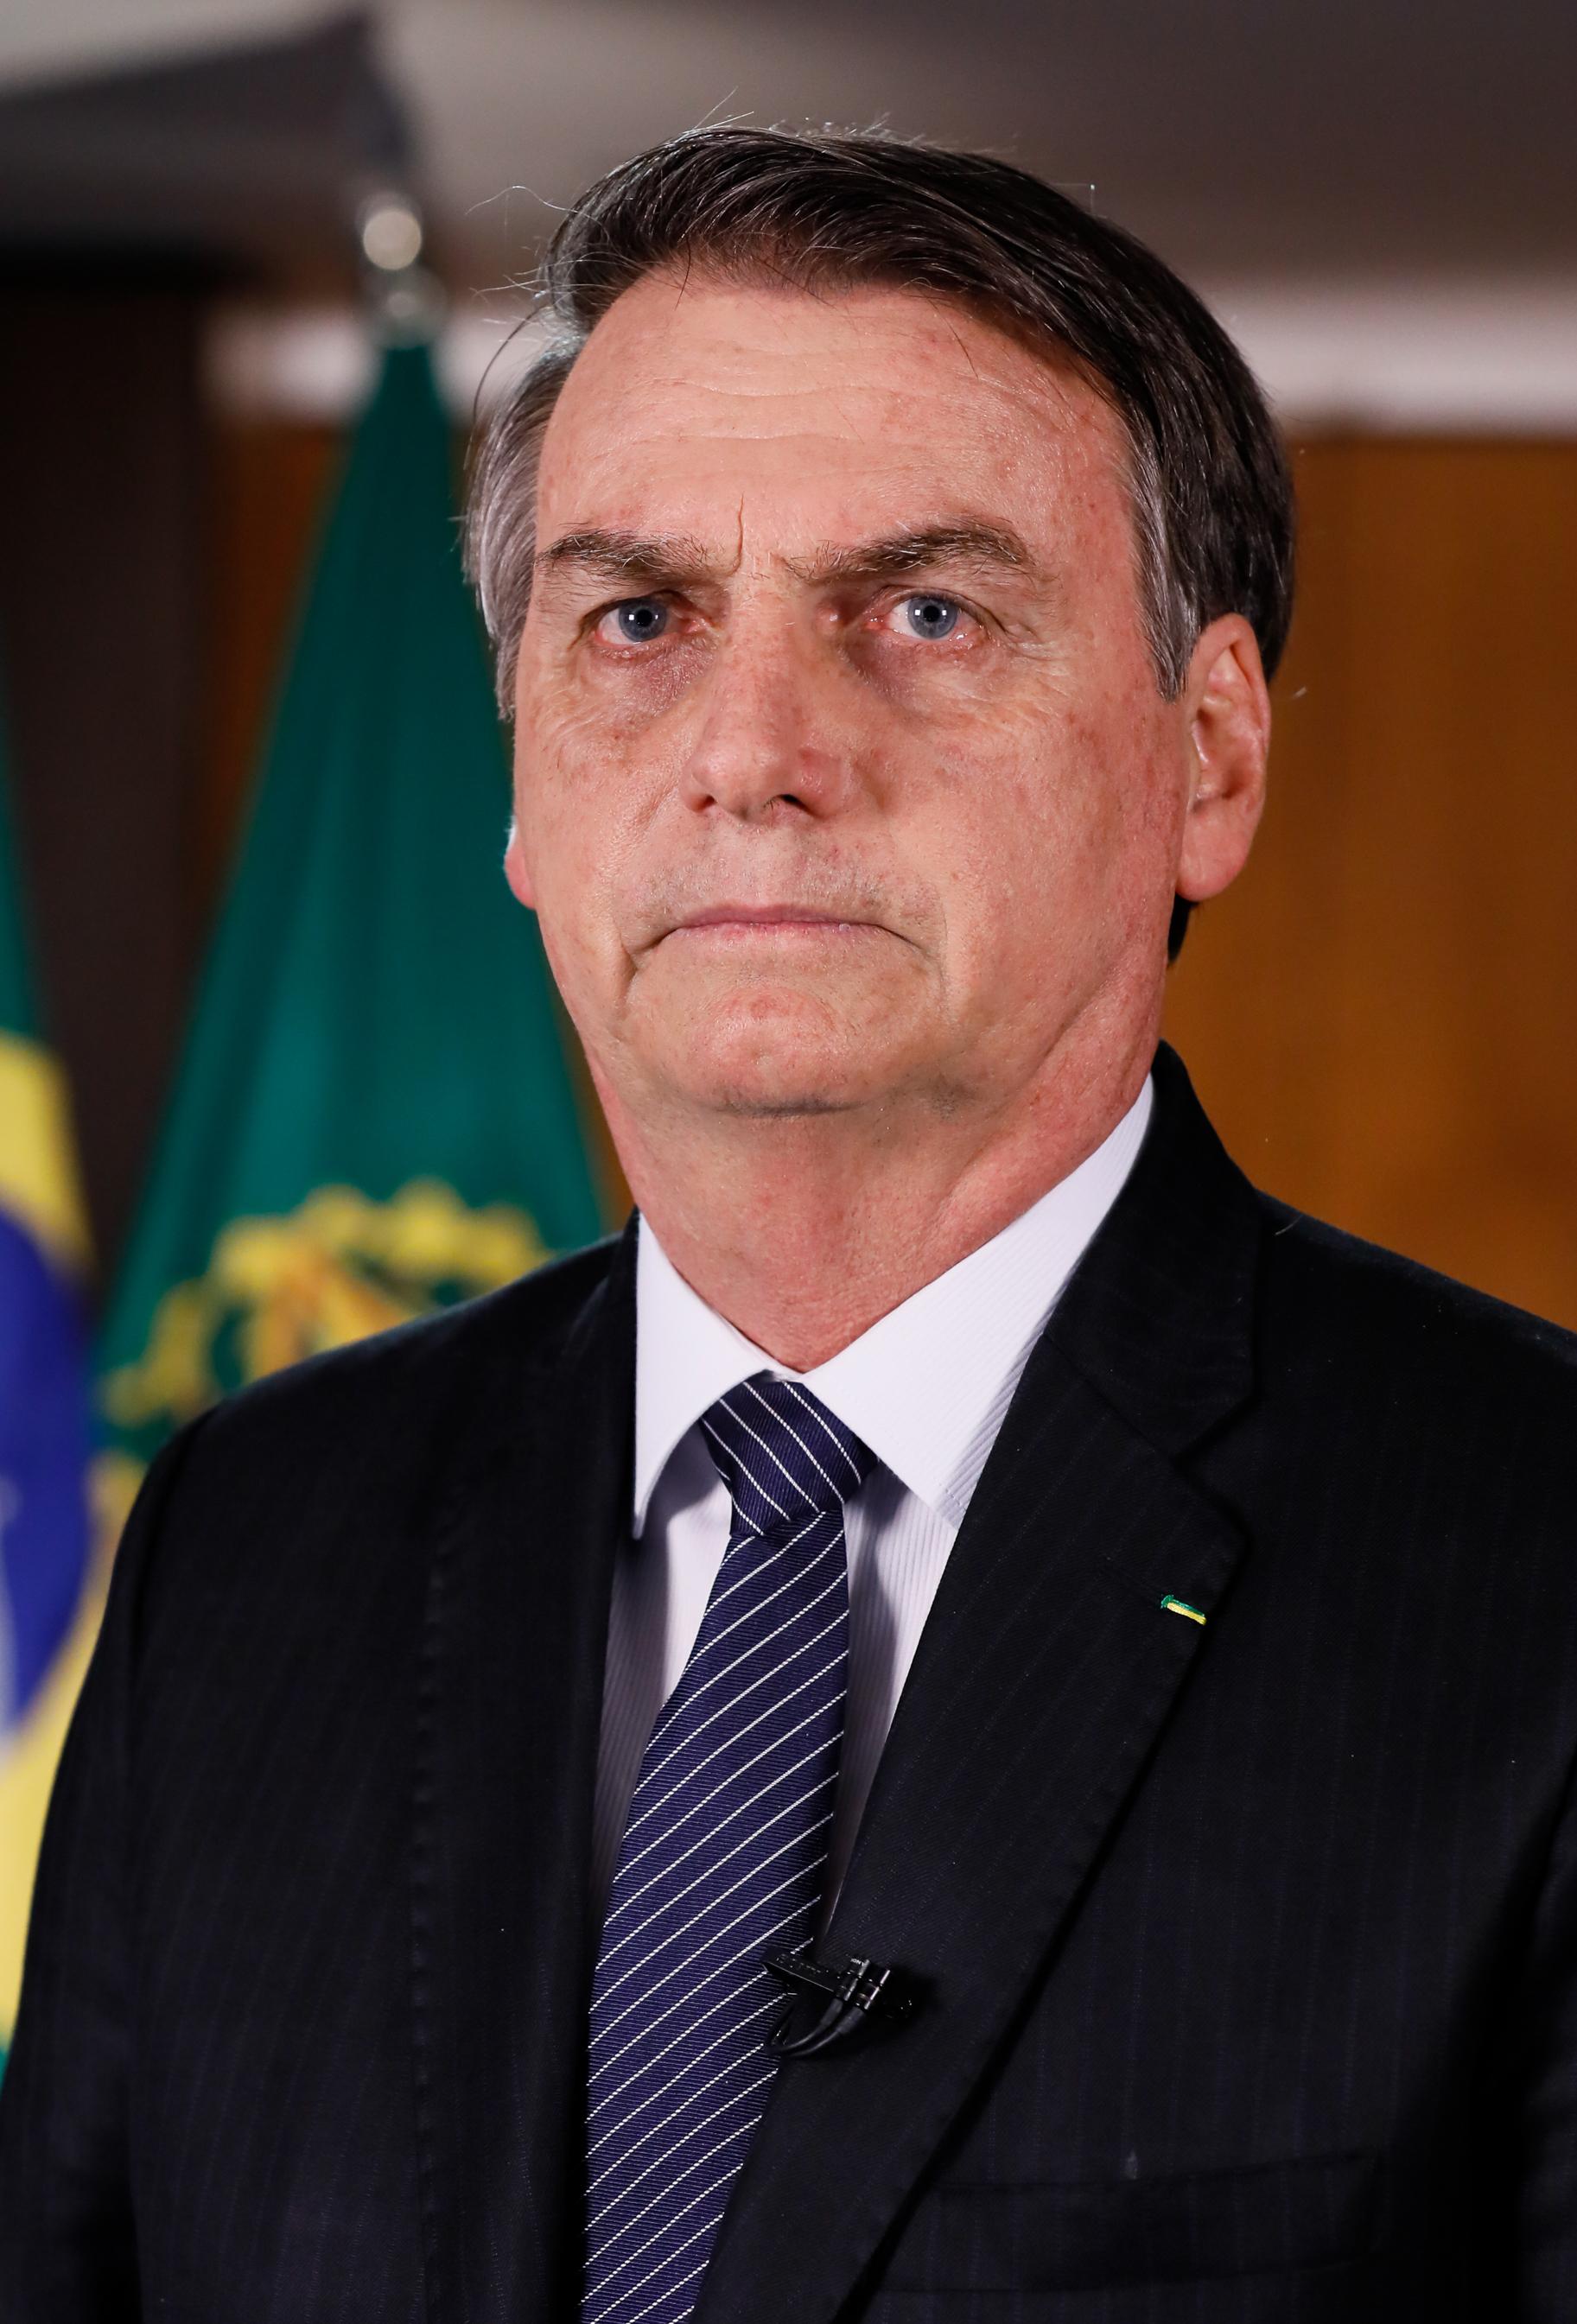 Foto8 Jair Bolsonaro Bolsonaro isentará cidadãos chineses de visto para entrar no Brasil